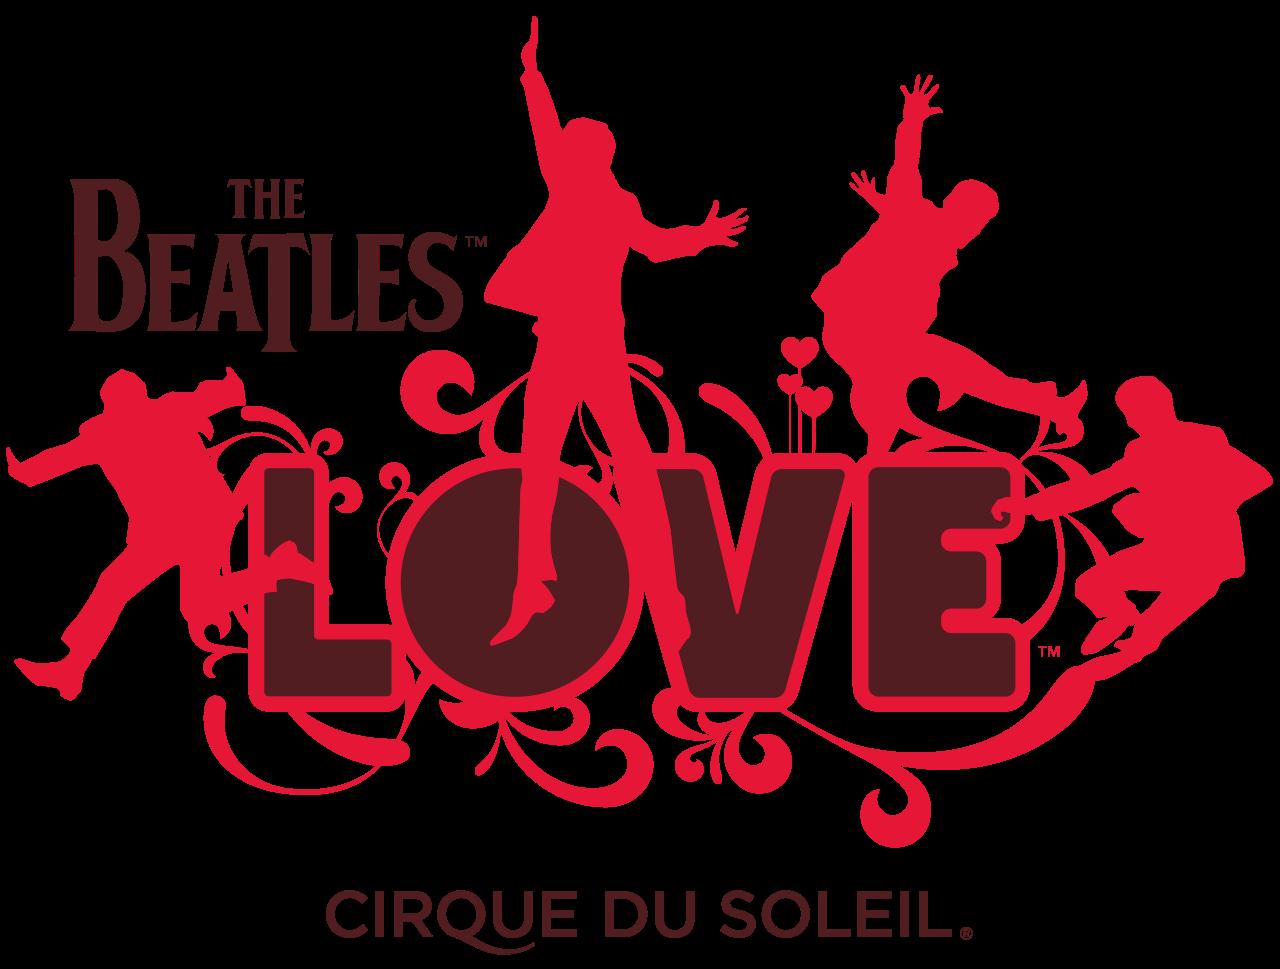 Beatle svg #7, Download drawings